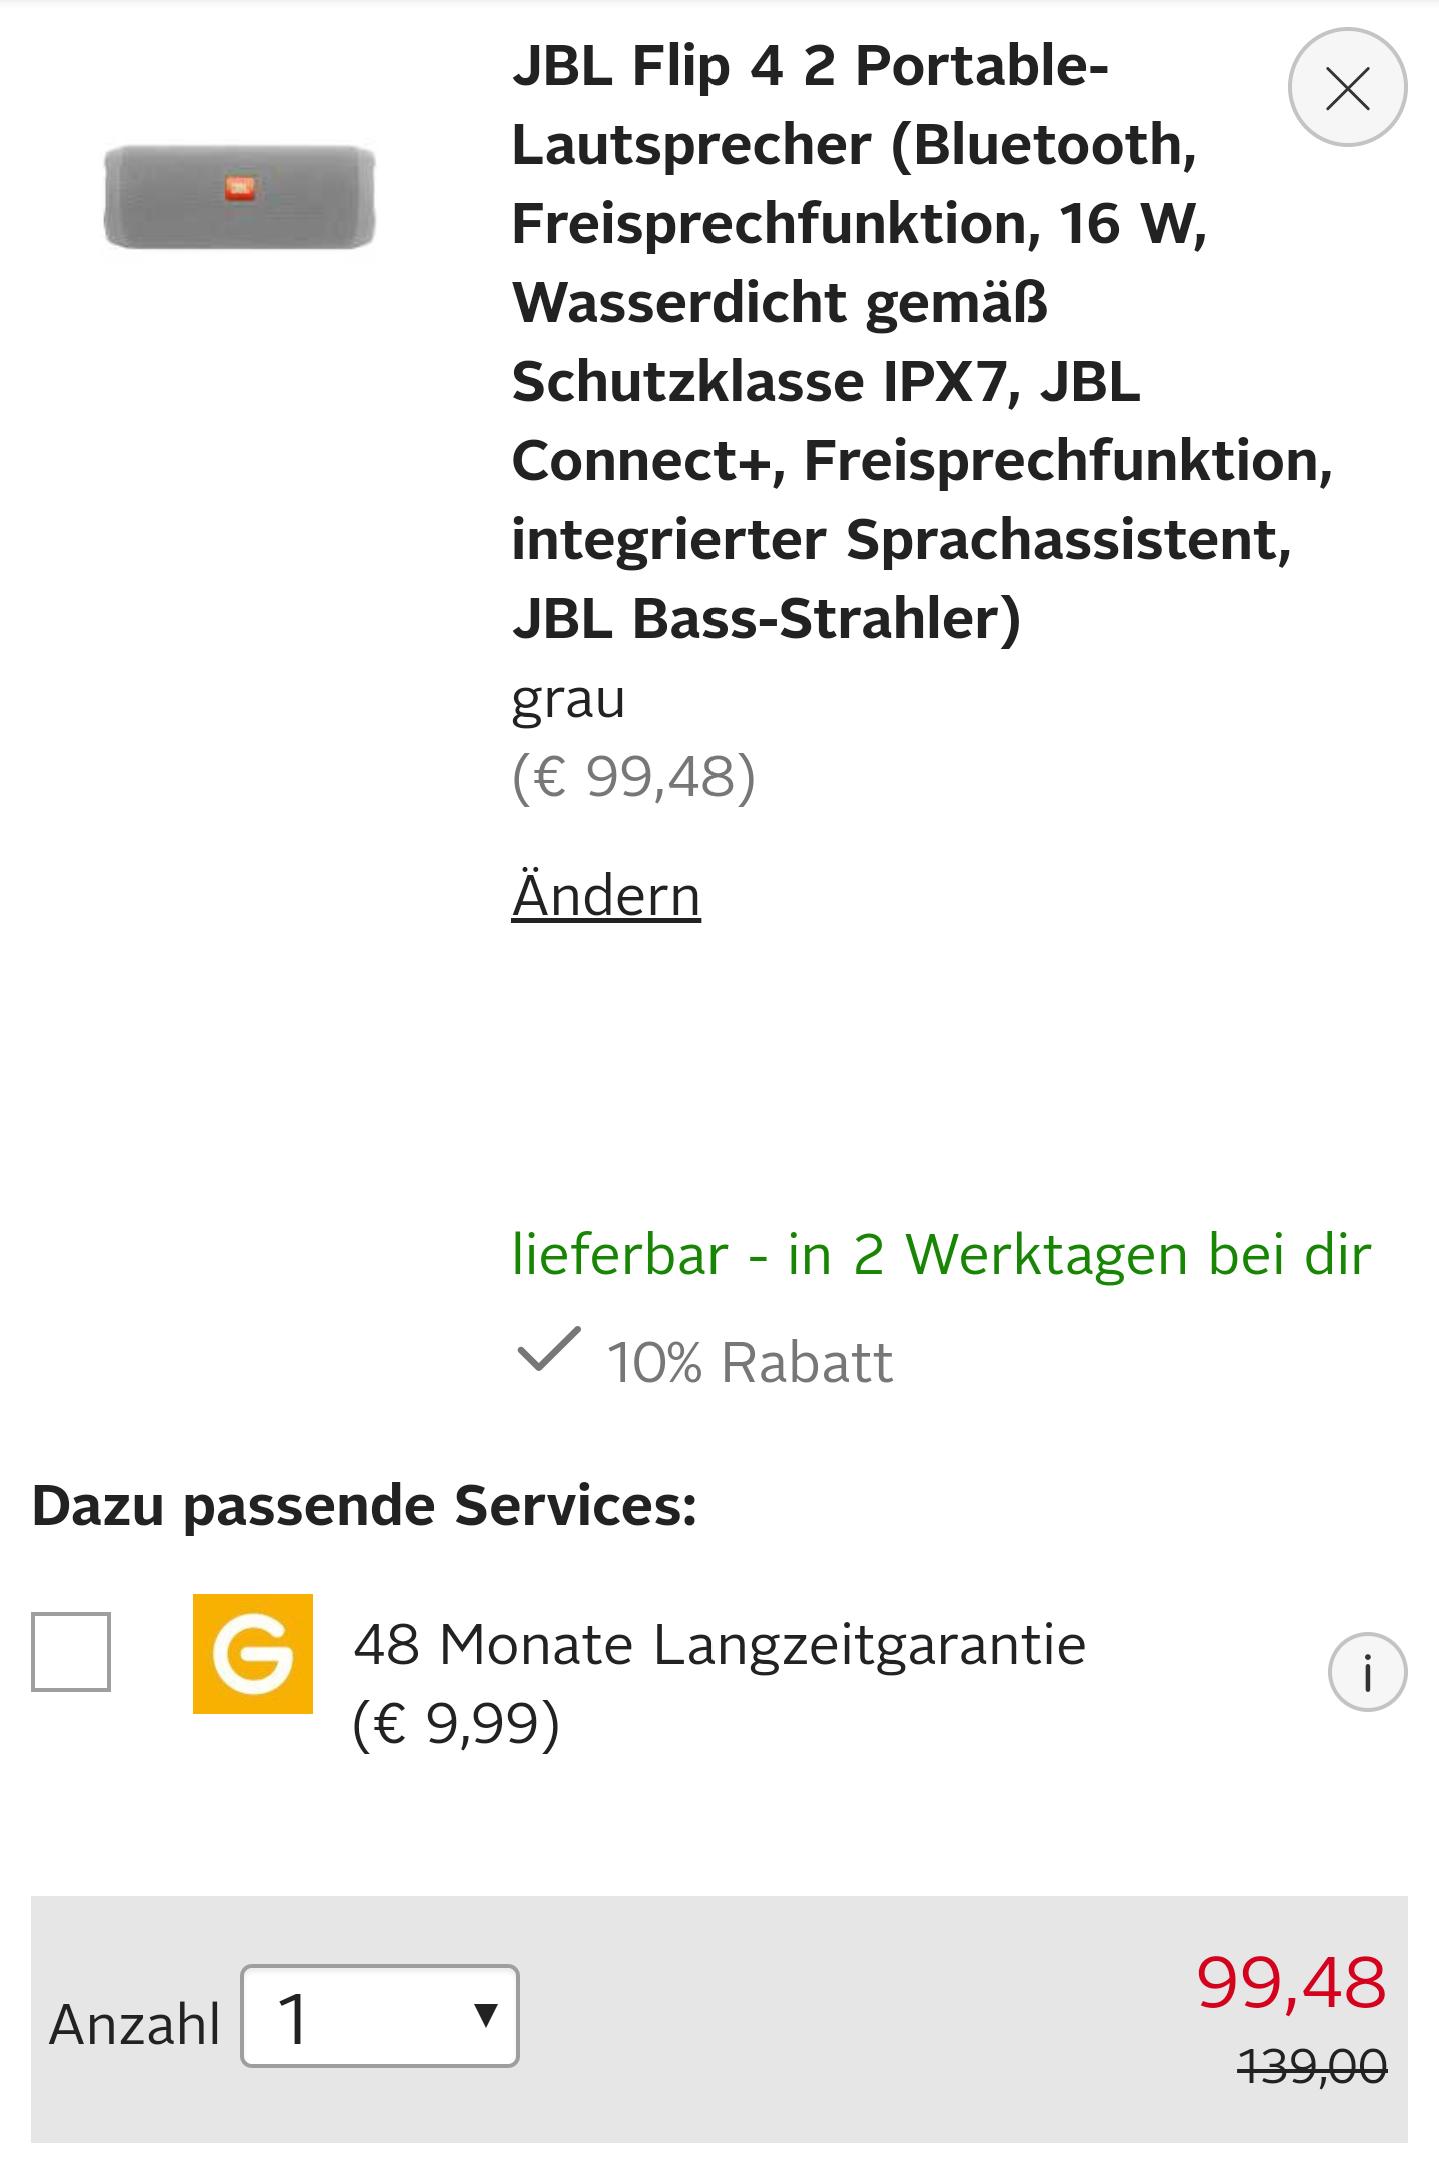 JBL Flip 4  2 Portable-Lautsprecher (grau)